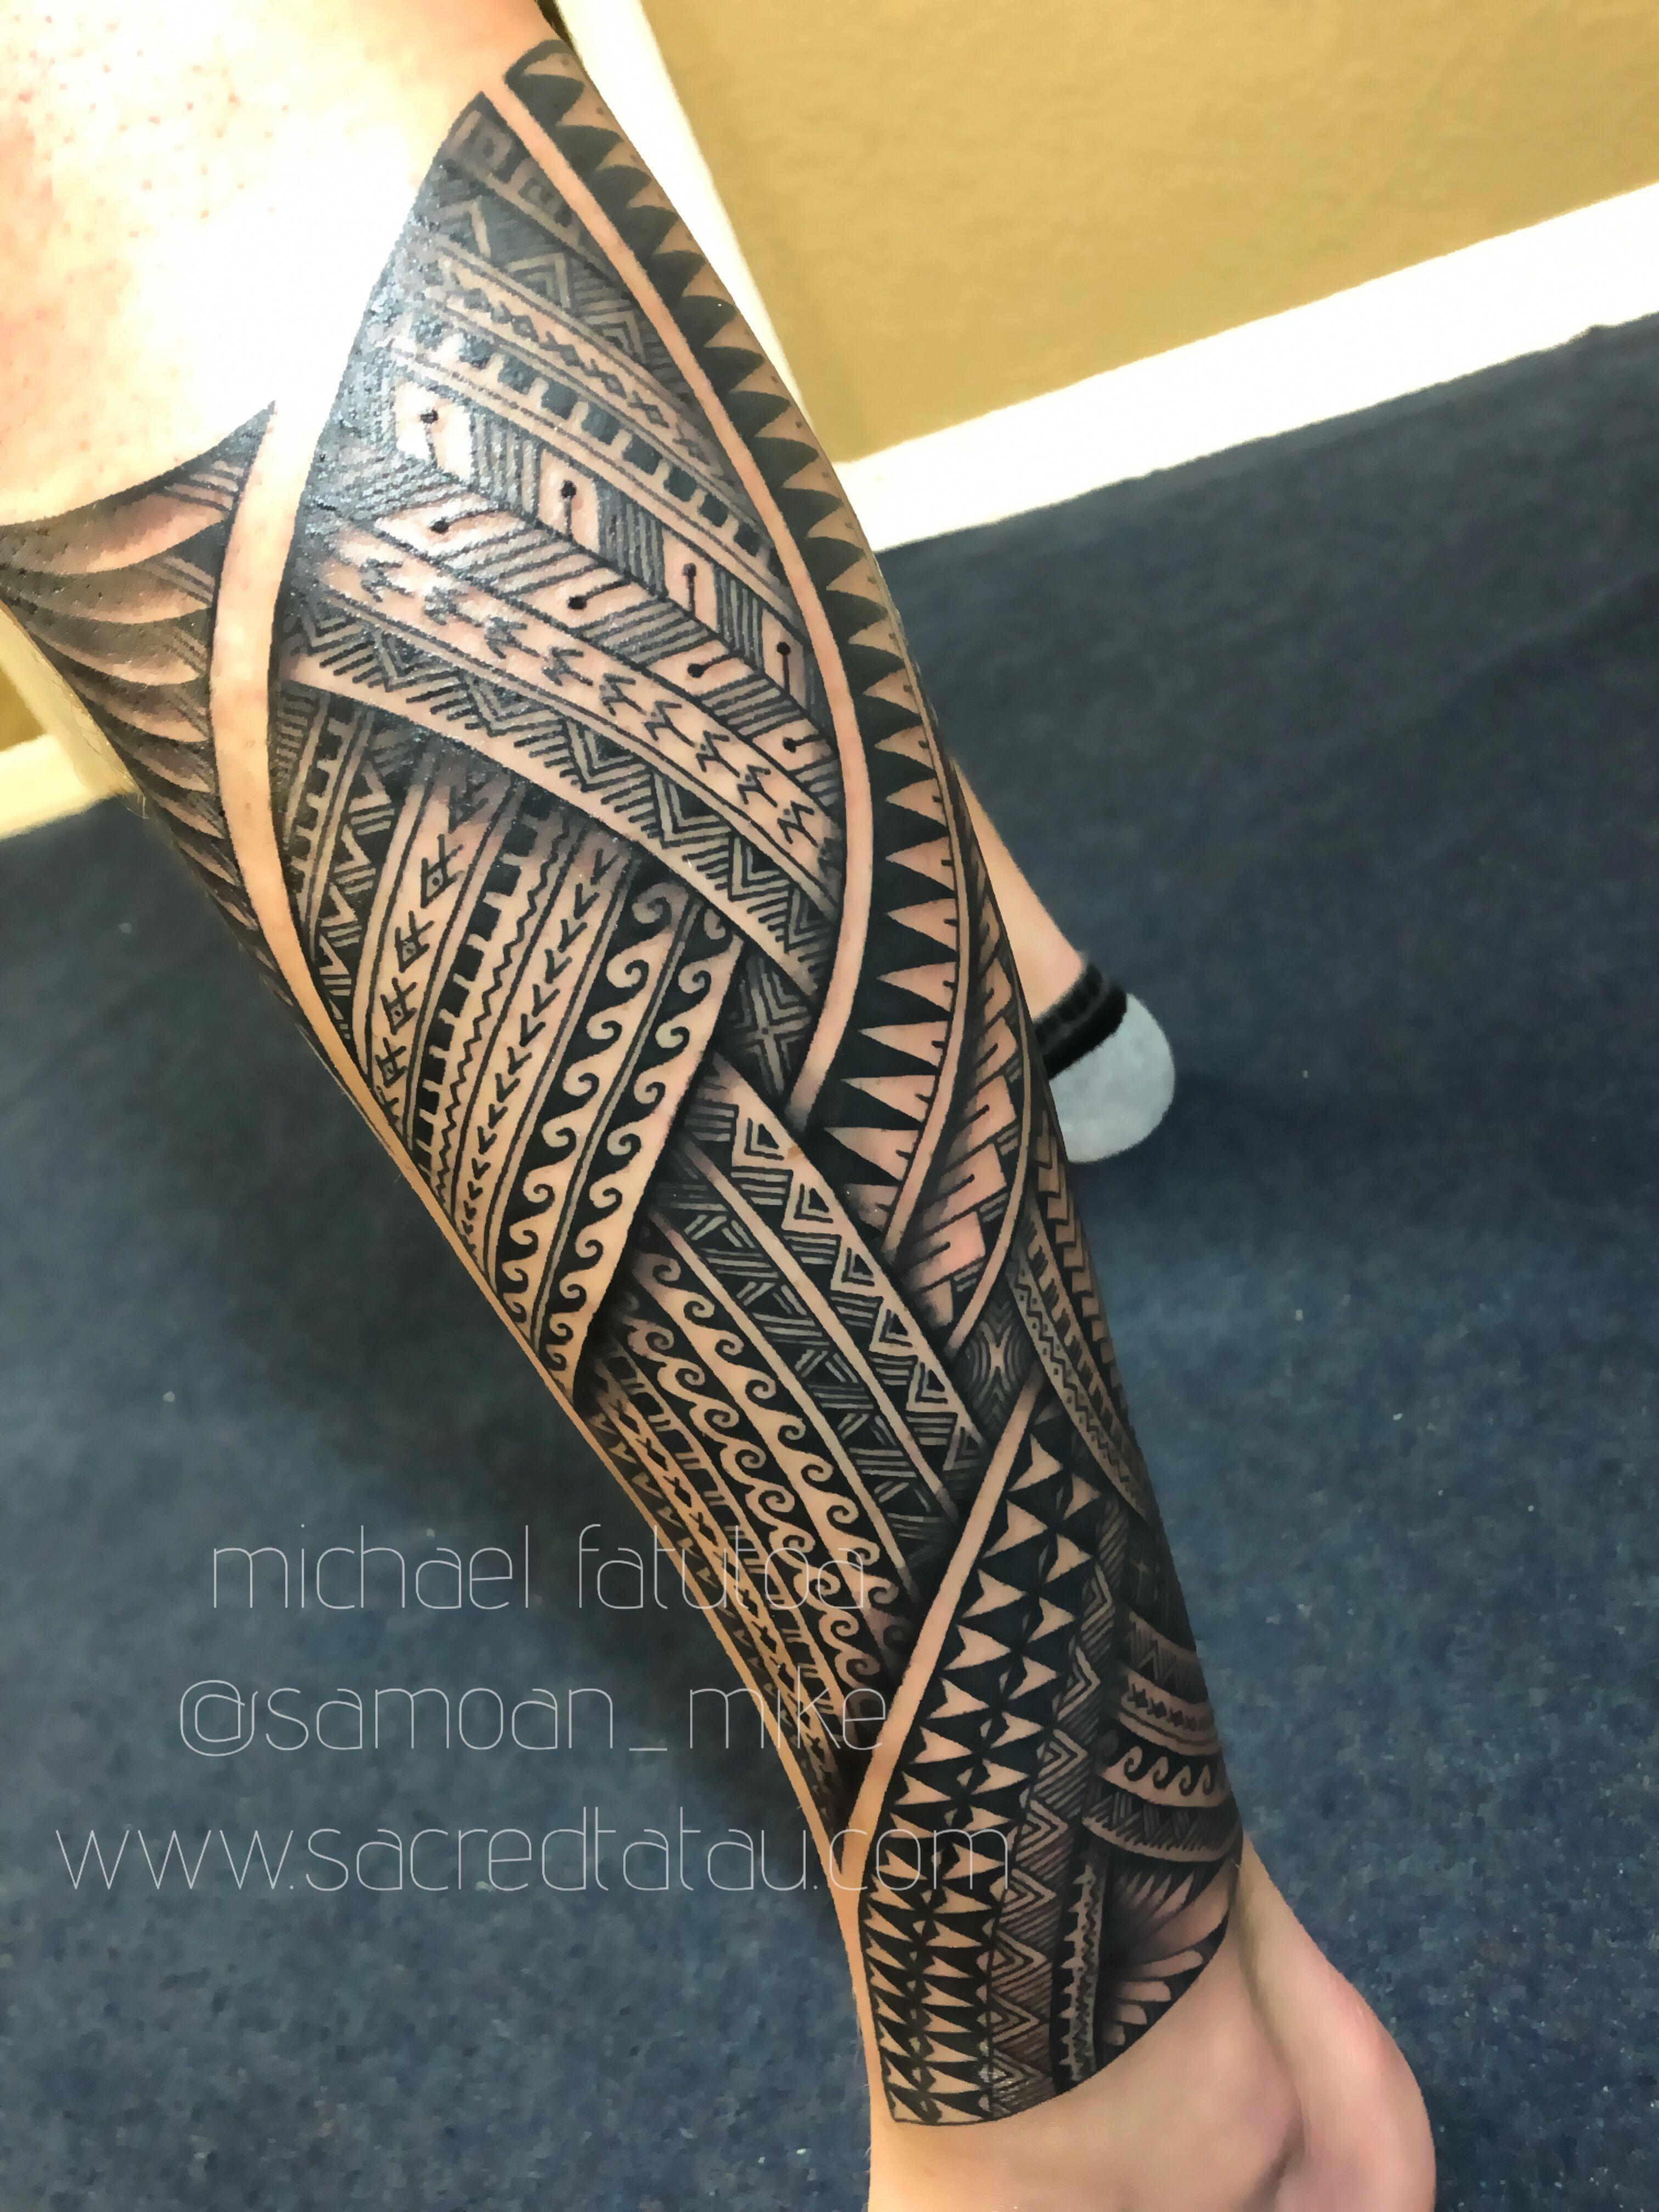 how much does polynesian tattoos cost Polynesiantattoos